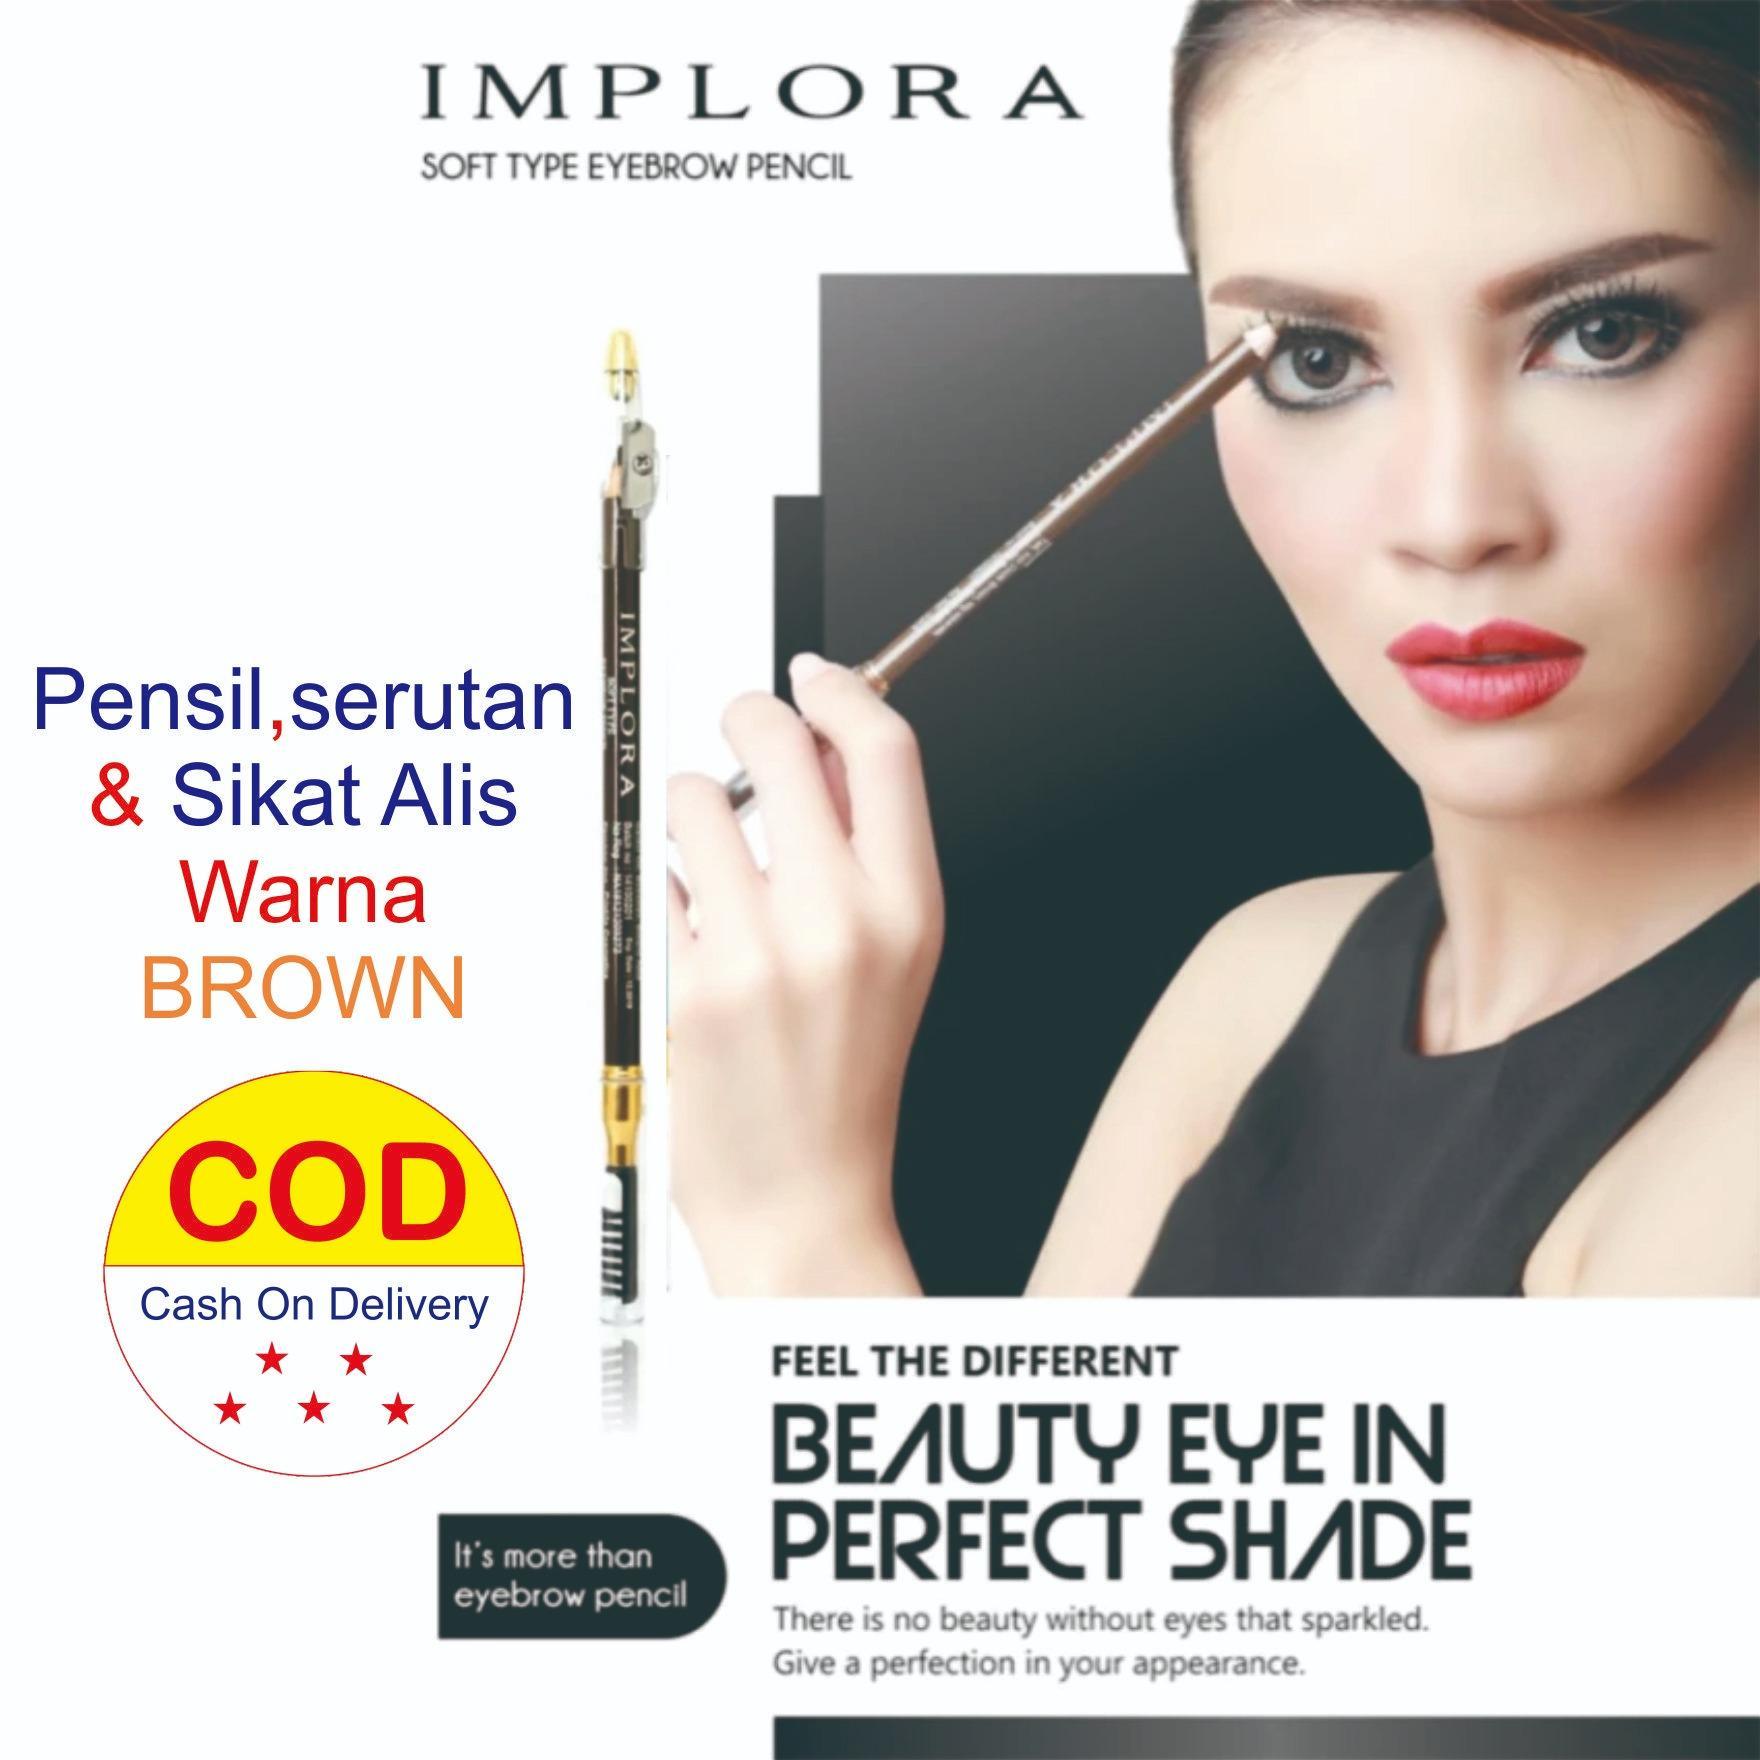 Wardah Eyebrow Pencil Pensil Alis Sikat Coklat 1pc Daftar Harga Eyebrowpensil Tahan Lama Implora 3in 1 Serutan Warna Sesuai Gambar